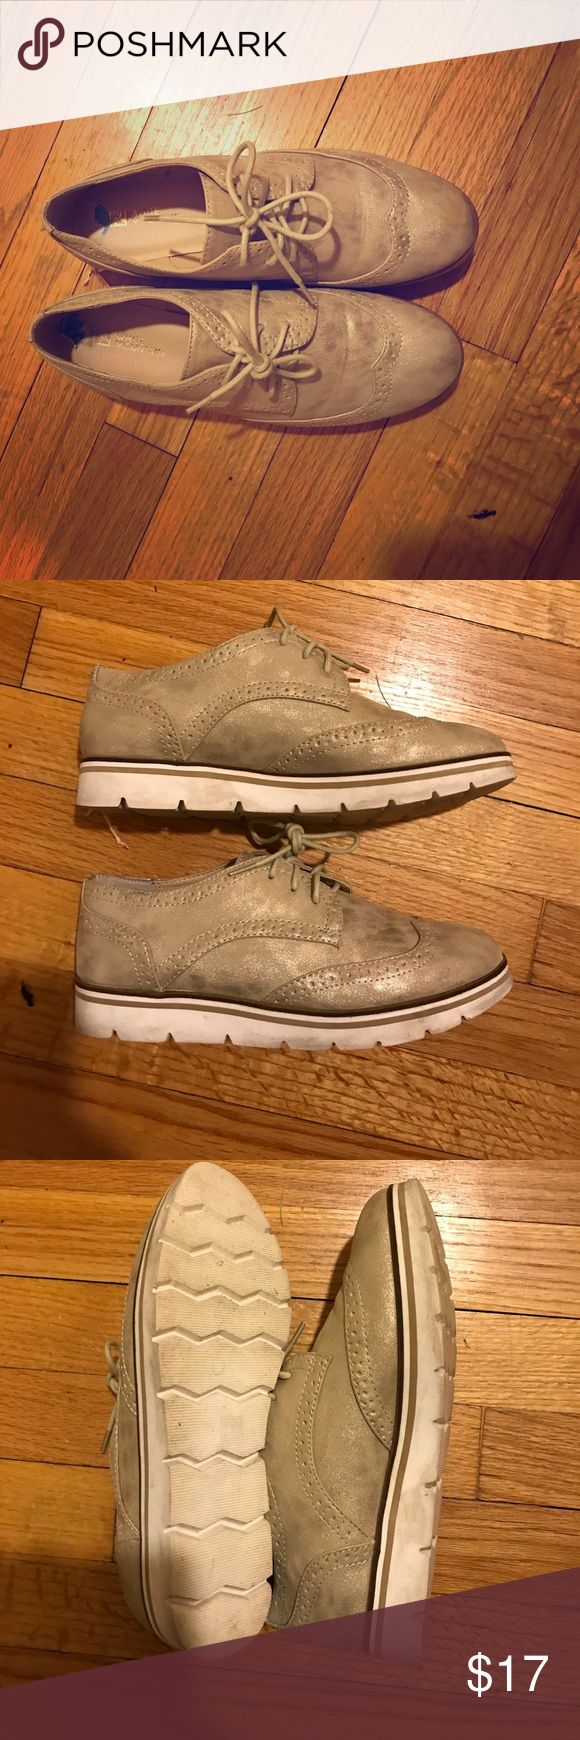 White Mountain Shoes Size 6 1/2 White Mountain Shoes White Mountain Shoes Flats & Loafers